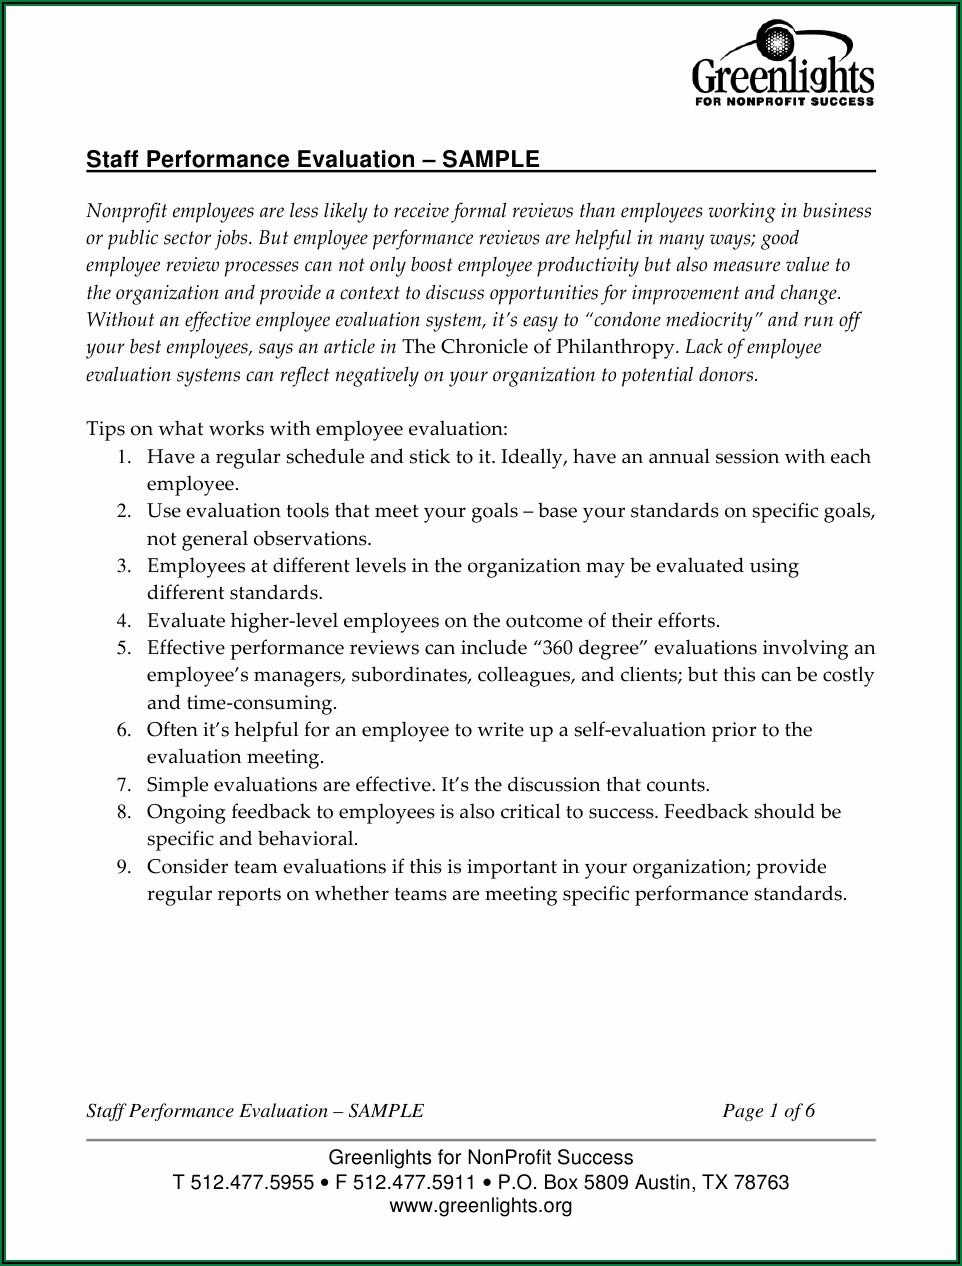 Staff Performance Evaluation Form Pdf